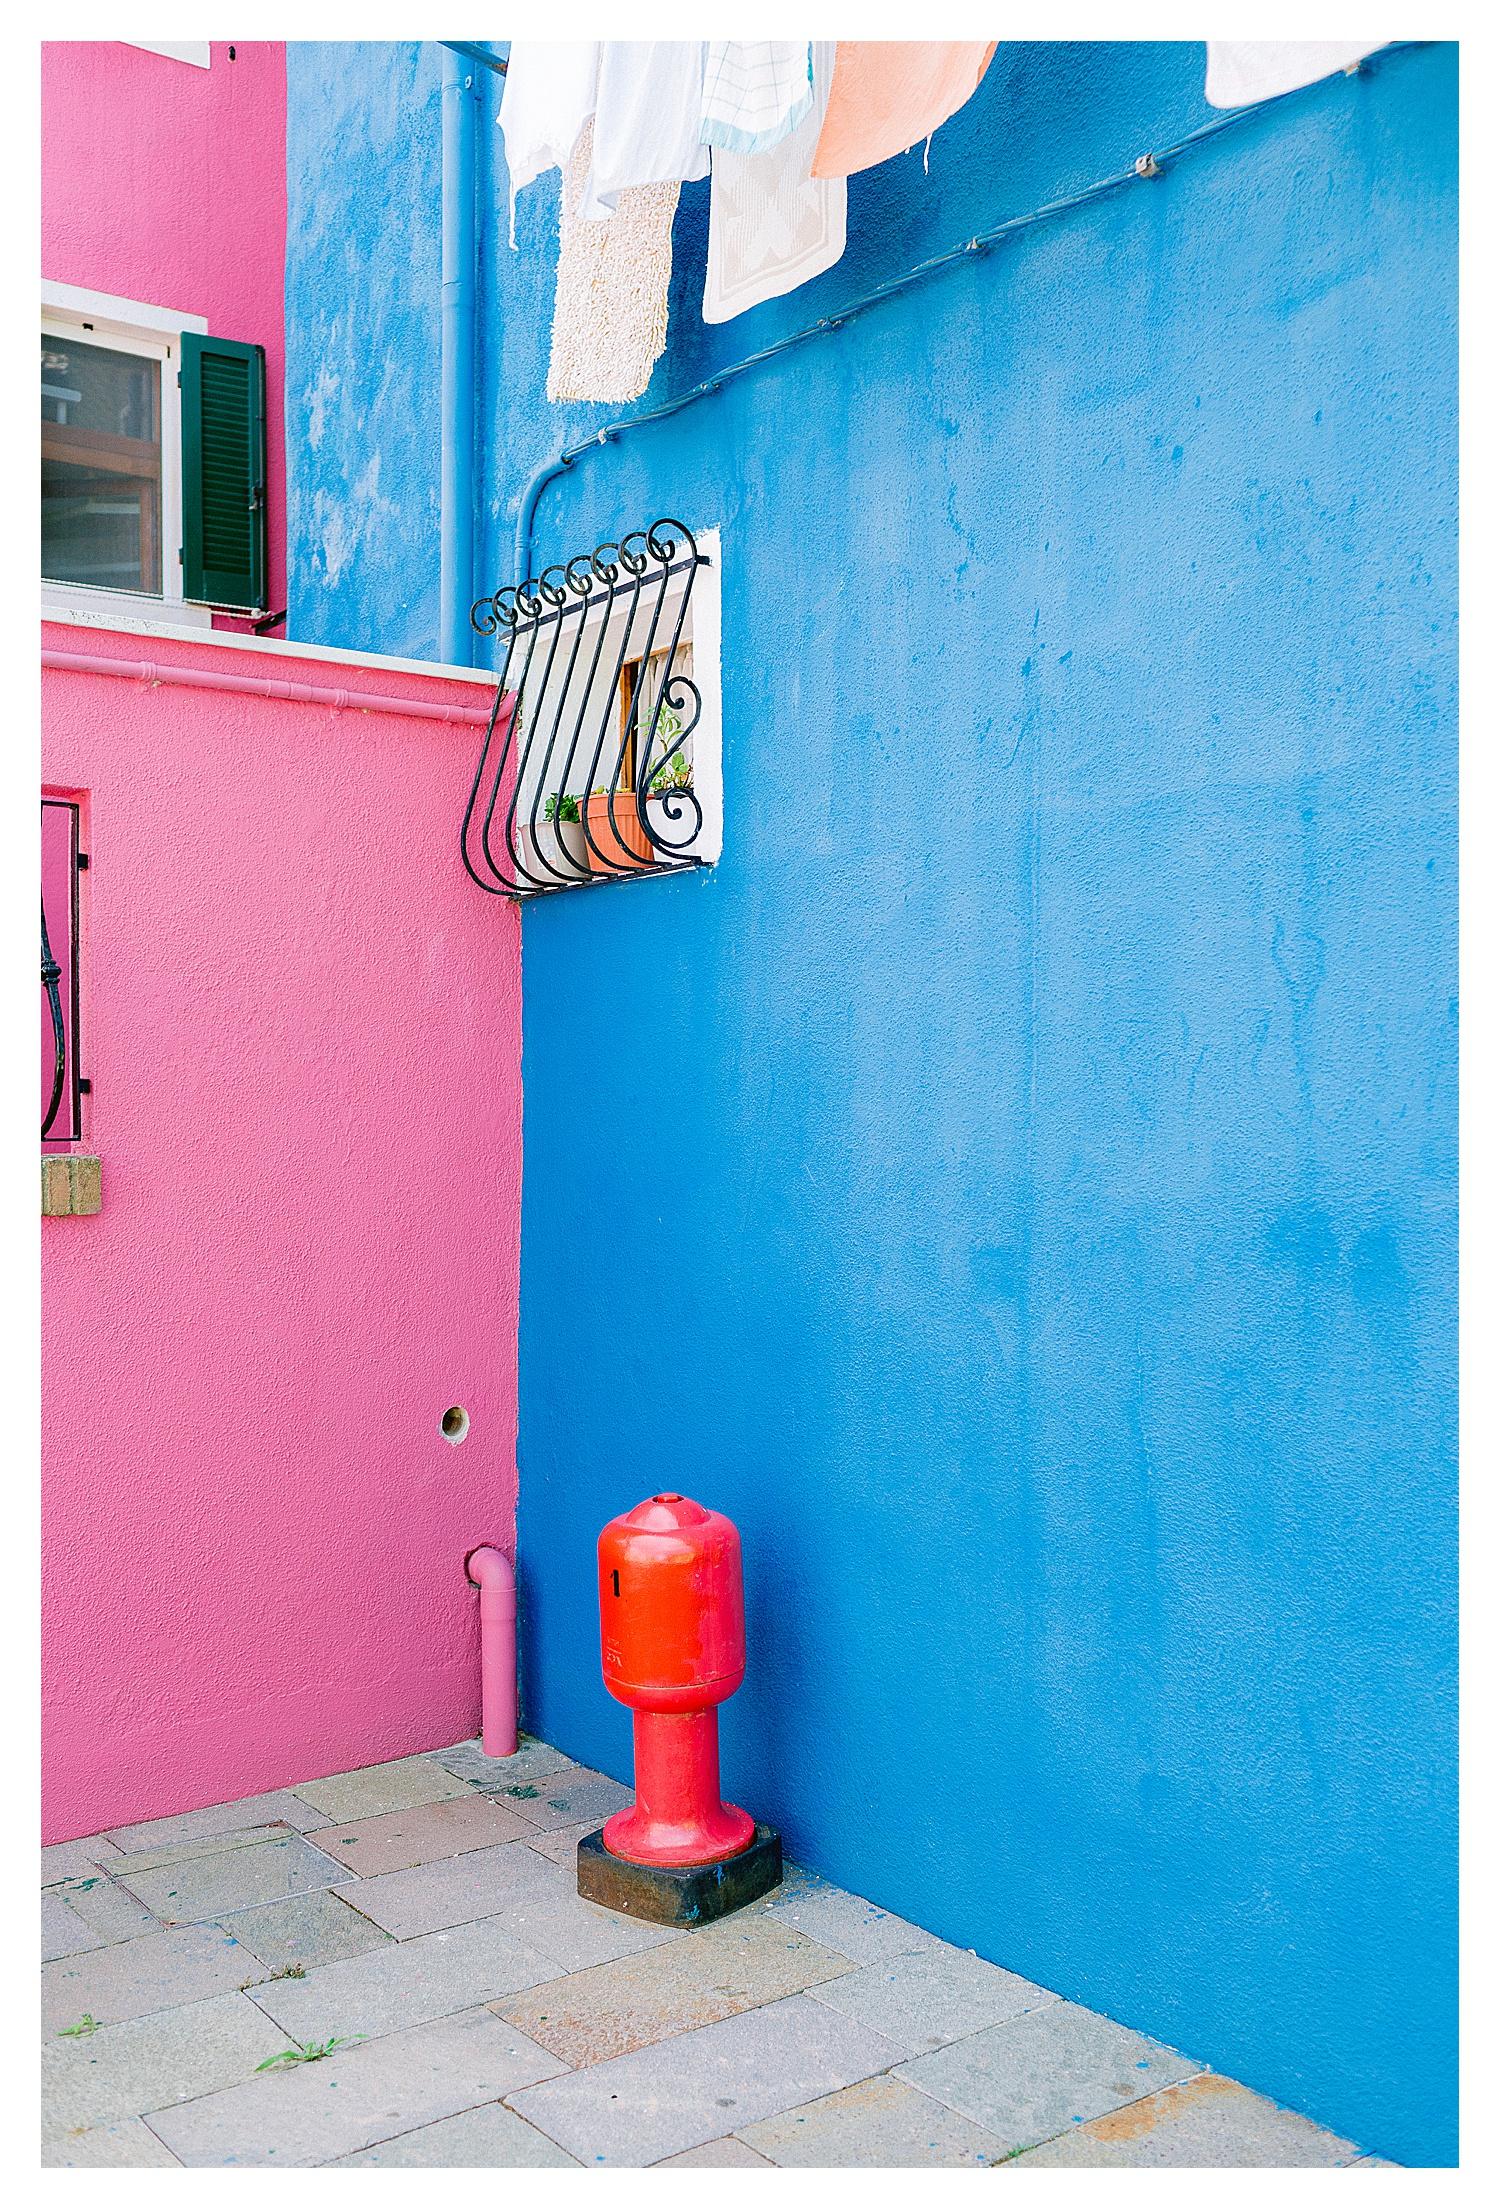 BURANO-VENICE-COUPLE-PHOTOSHOOT-COLORFUL-stefano-degirmenci_0503.jpg